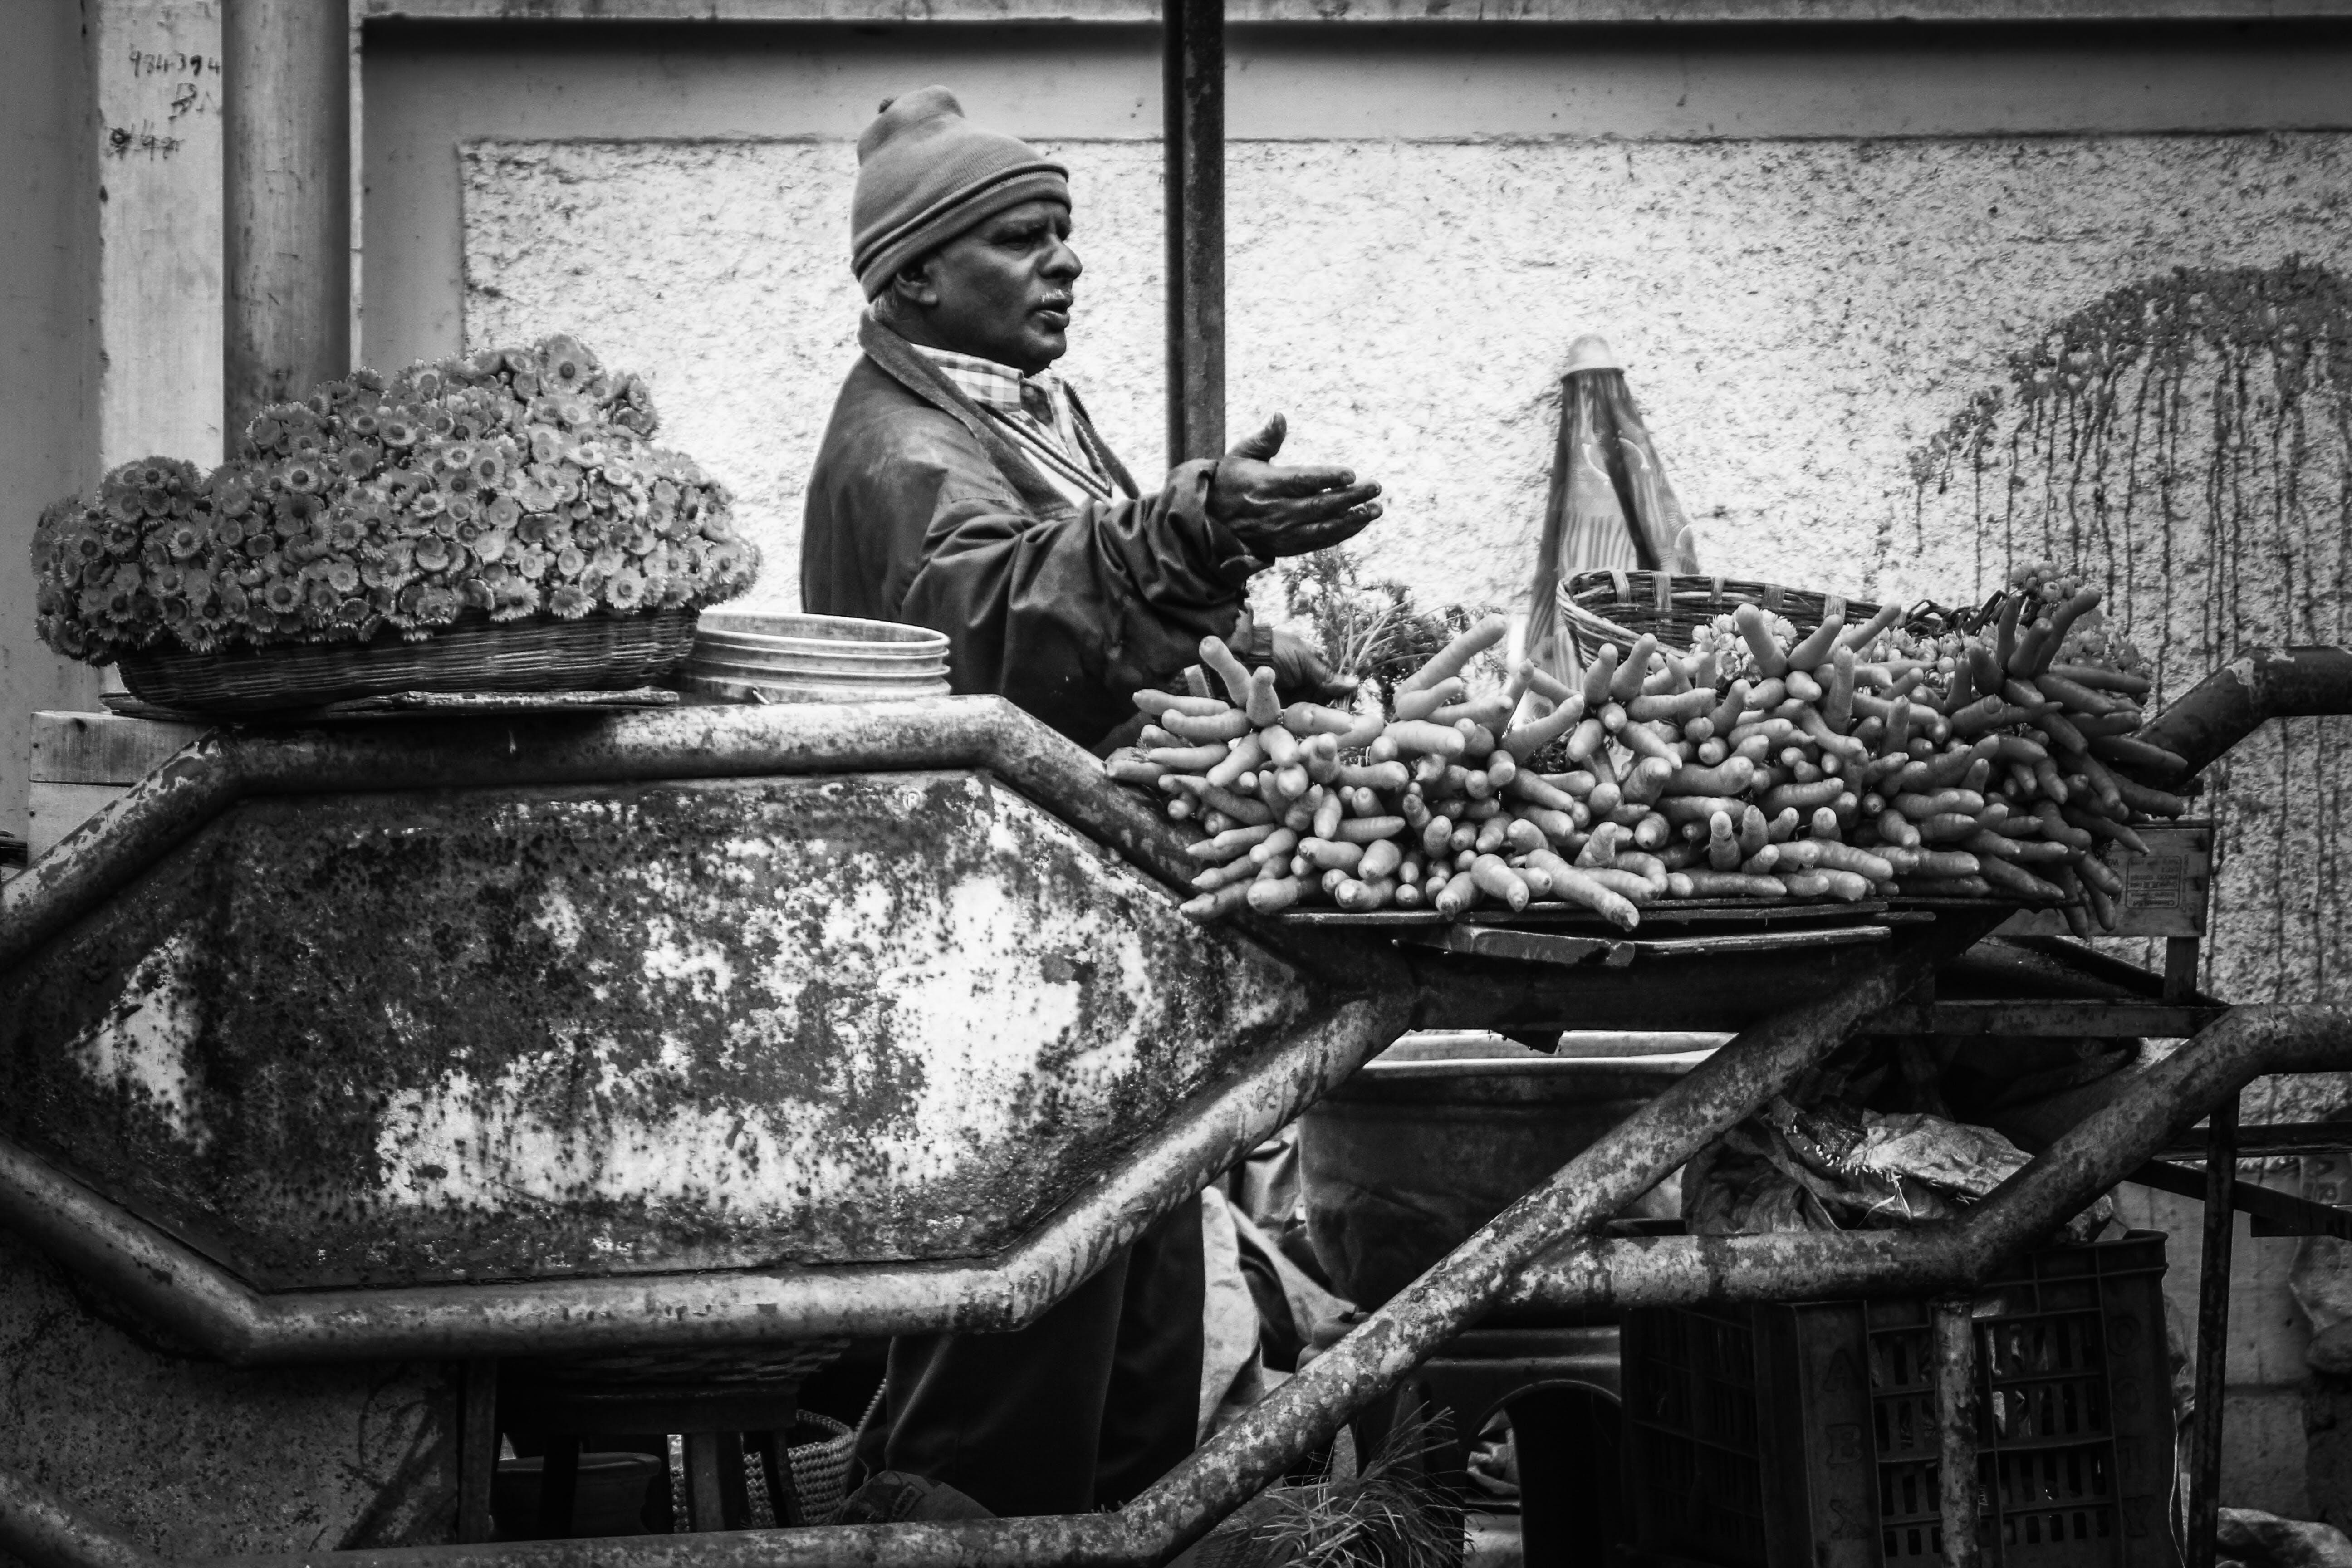 Free stock photo of seller, street photo